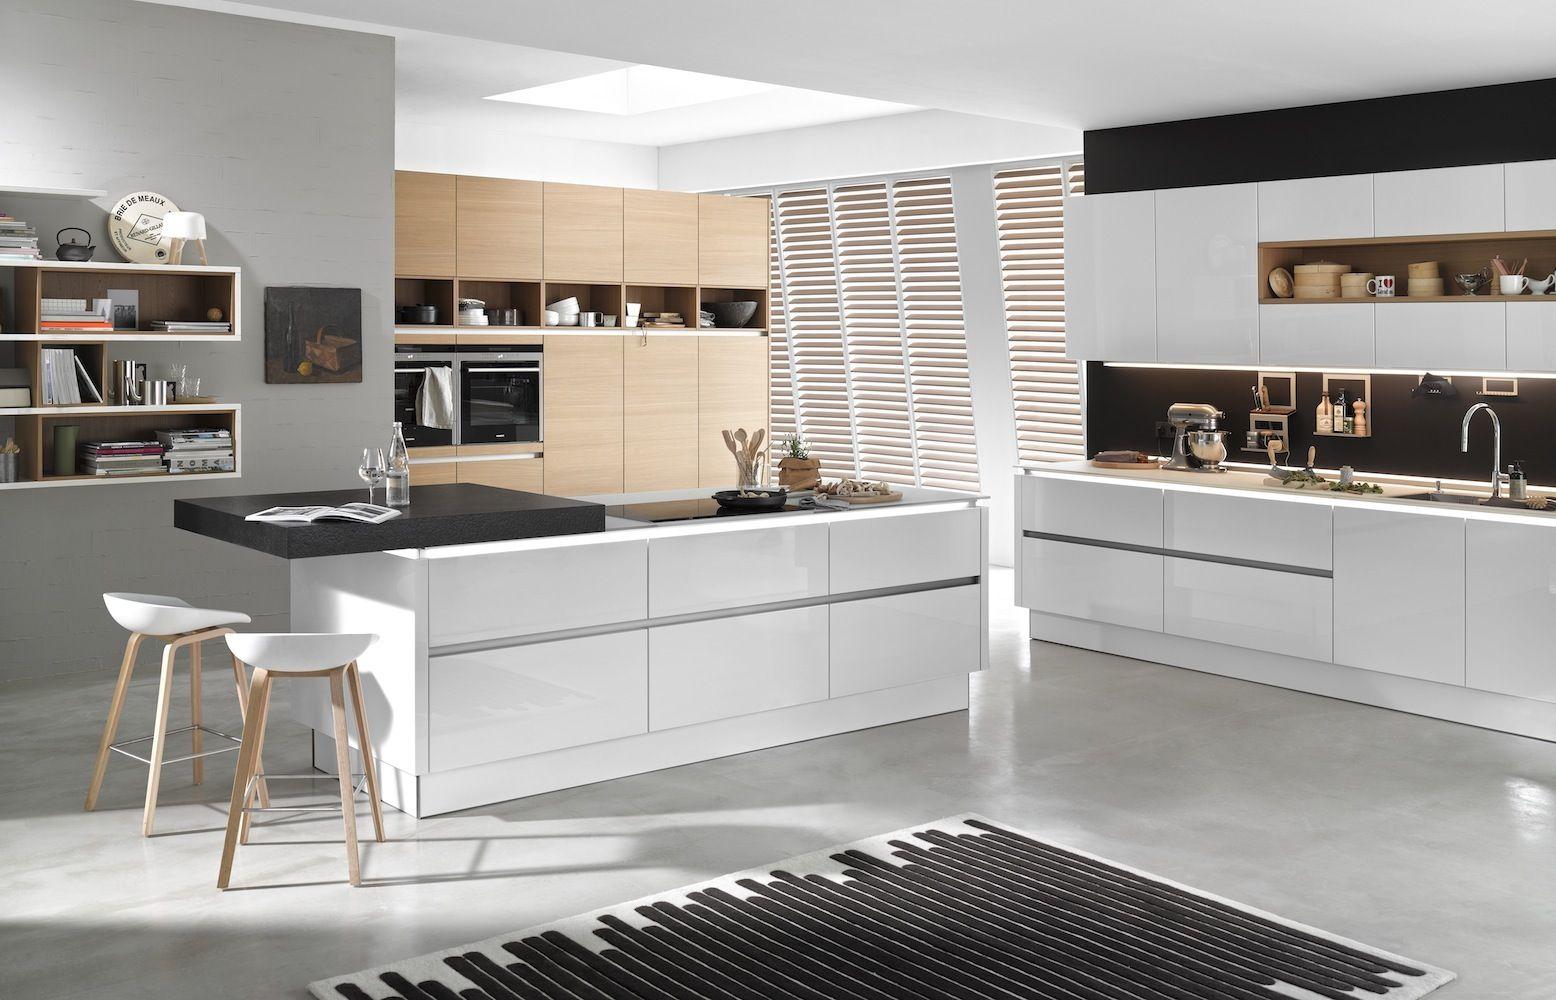 Awesome Nolte handleless kitchen with Matrix Art LED lighting